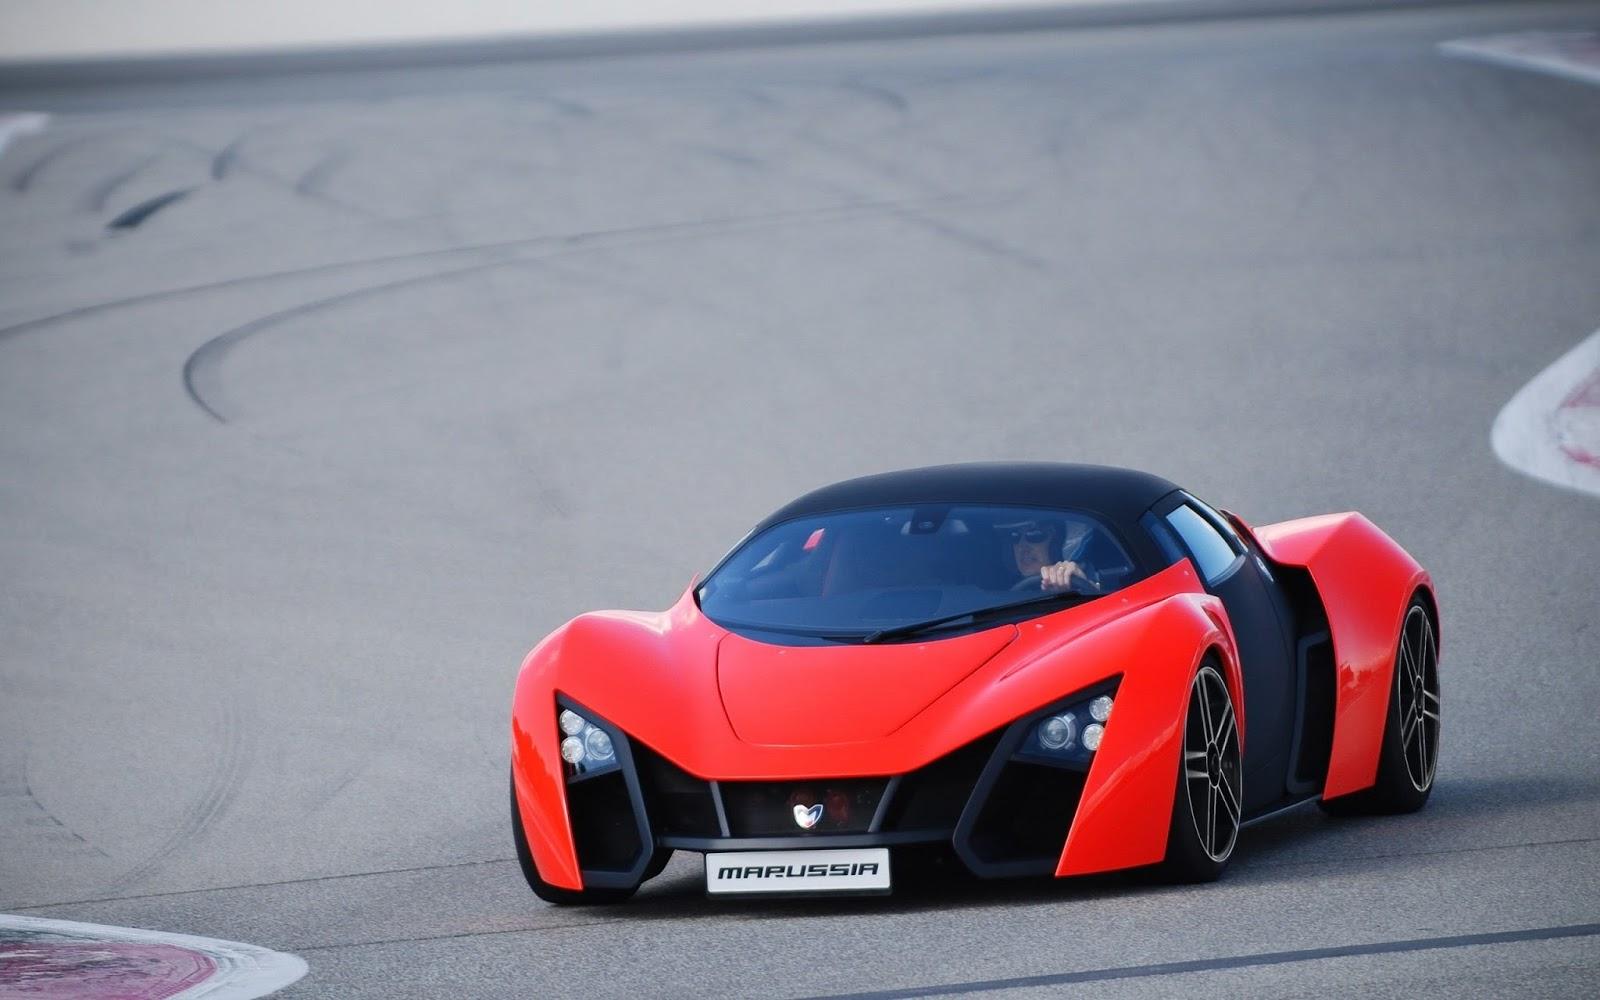 super fast sports cars wallpapers top super fast cars hd wallpapers - Super Fast Cars